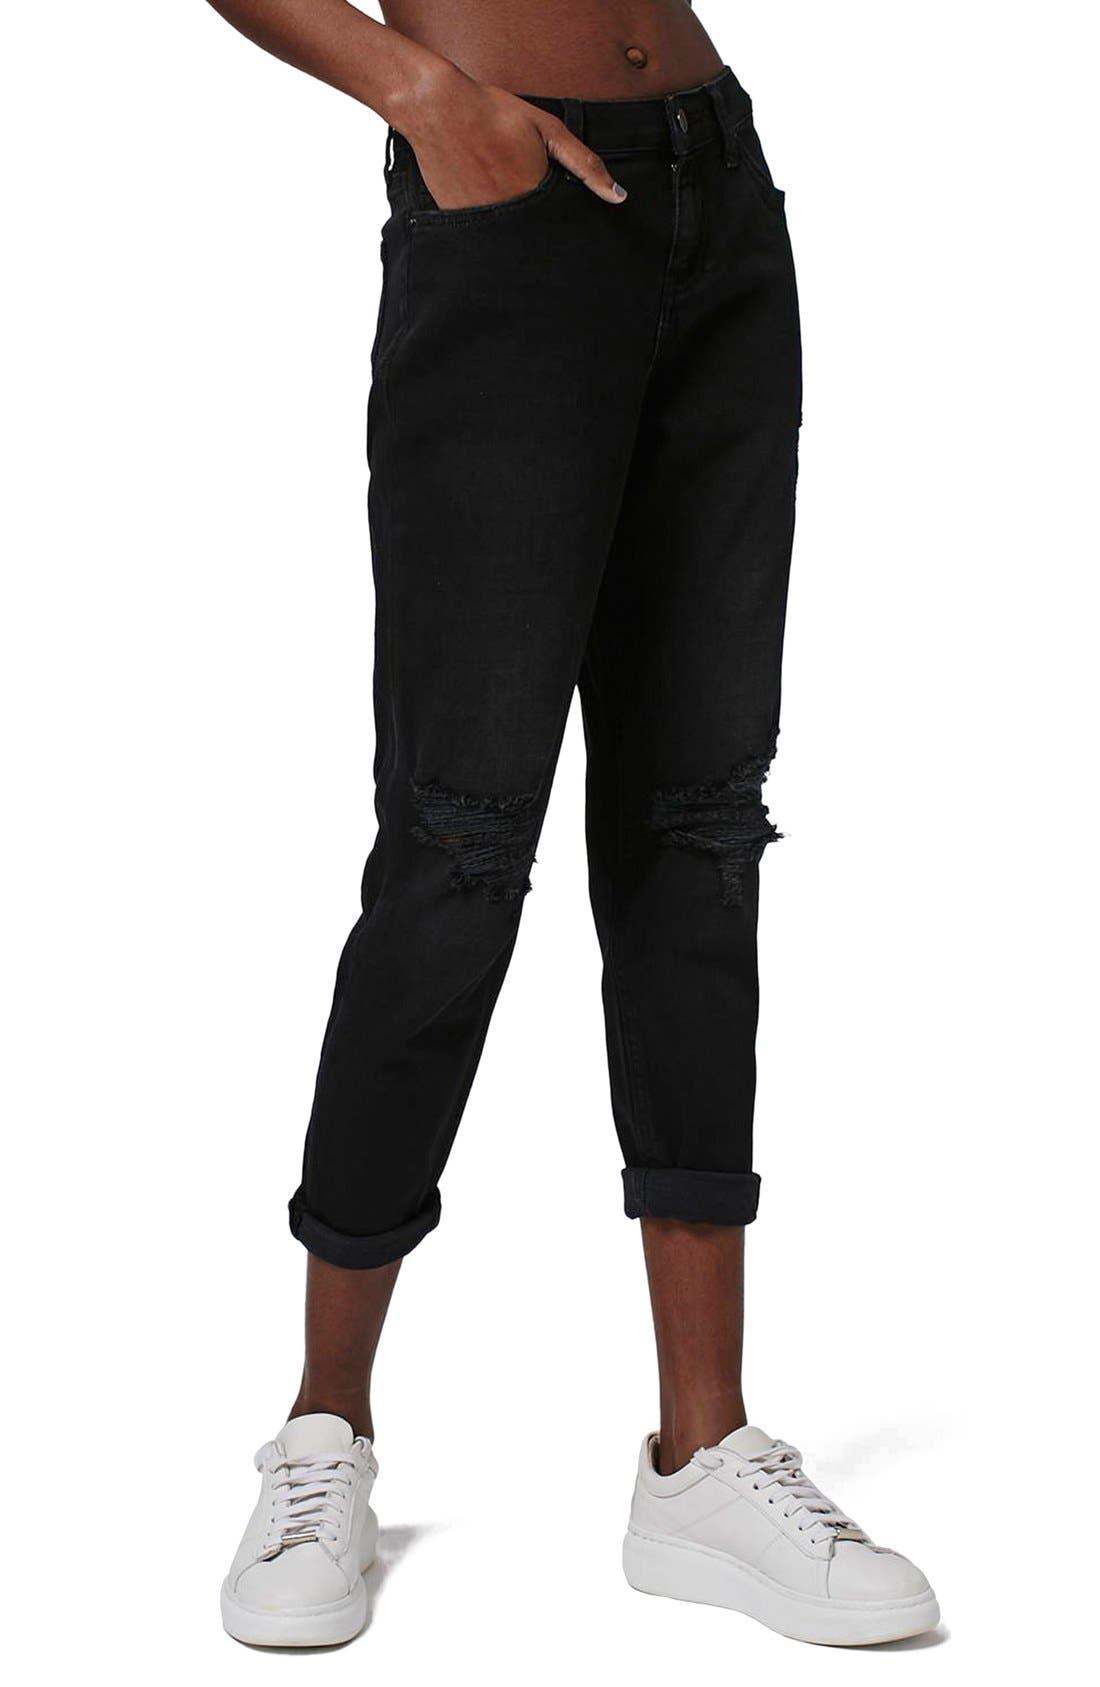 Alternate Image 1 Selected - Topshop 'Lucas' Ripped Boyfriend Jeans (Petite)